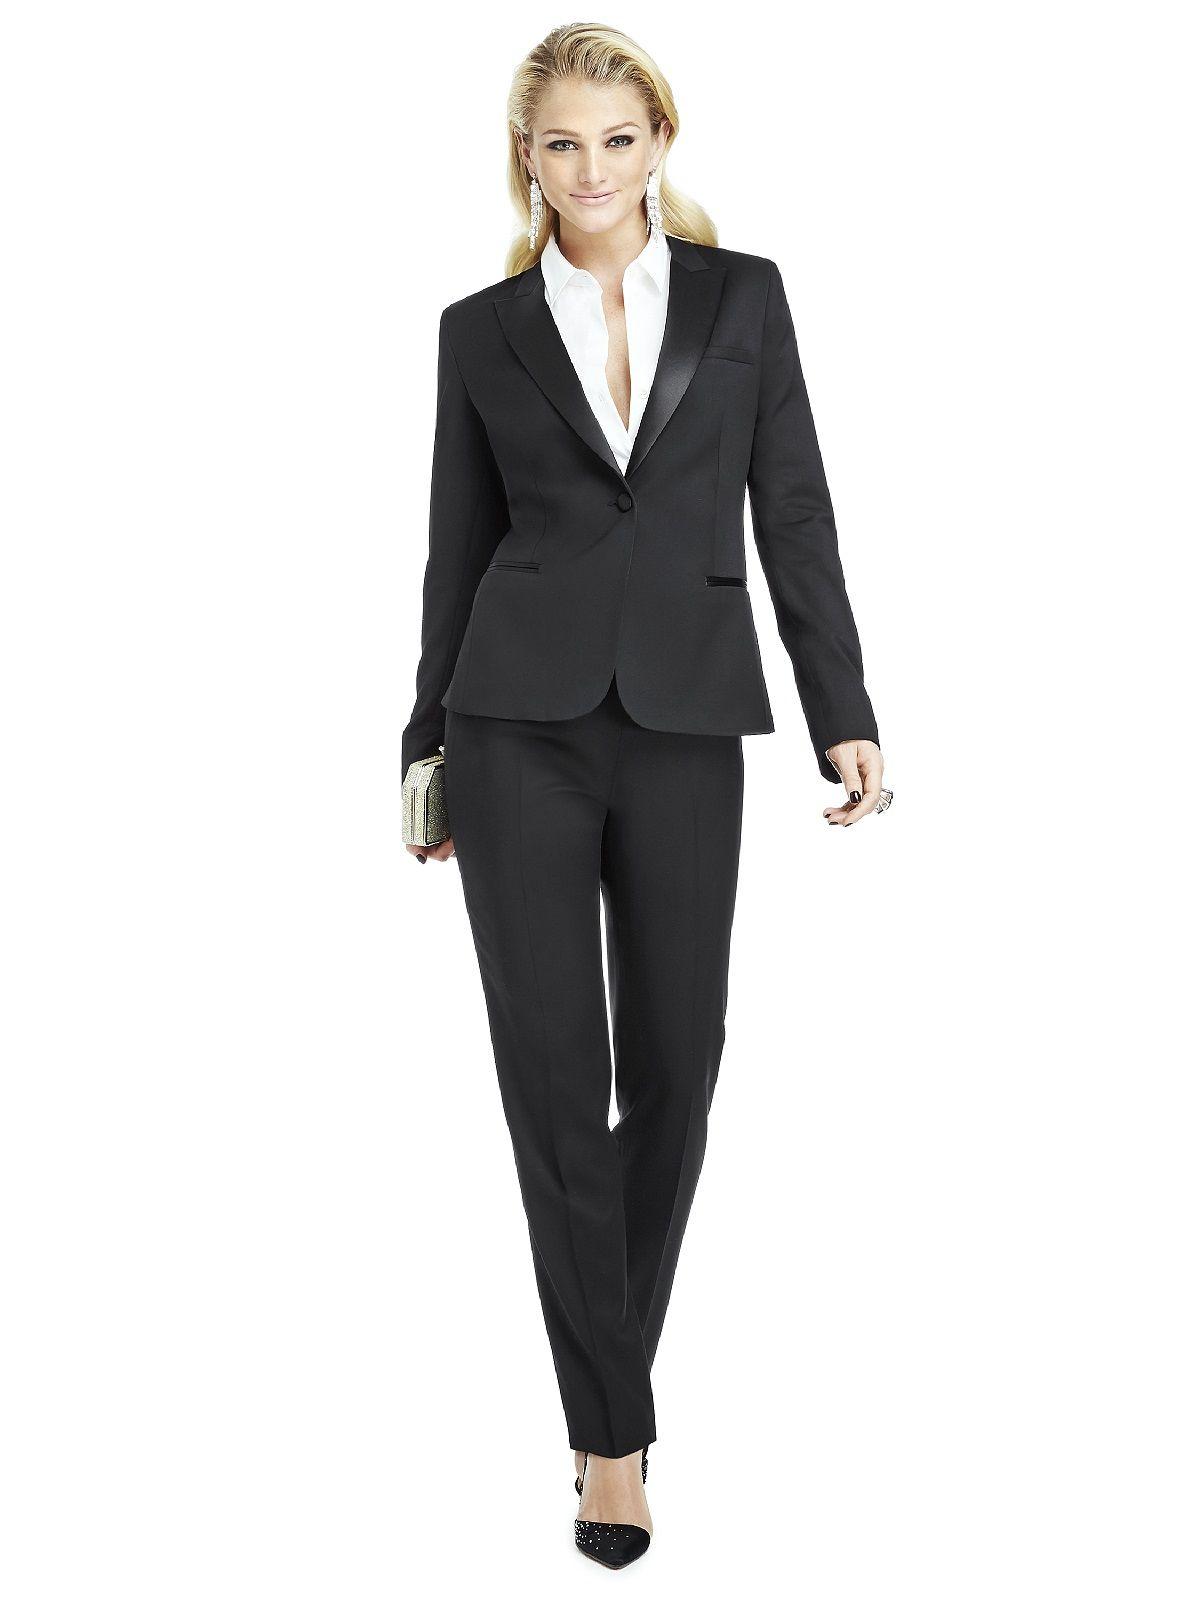 Marlowe Women\'s Tuxedo Jacket - Peak Collar | Womens tuxedo jacket ...